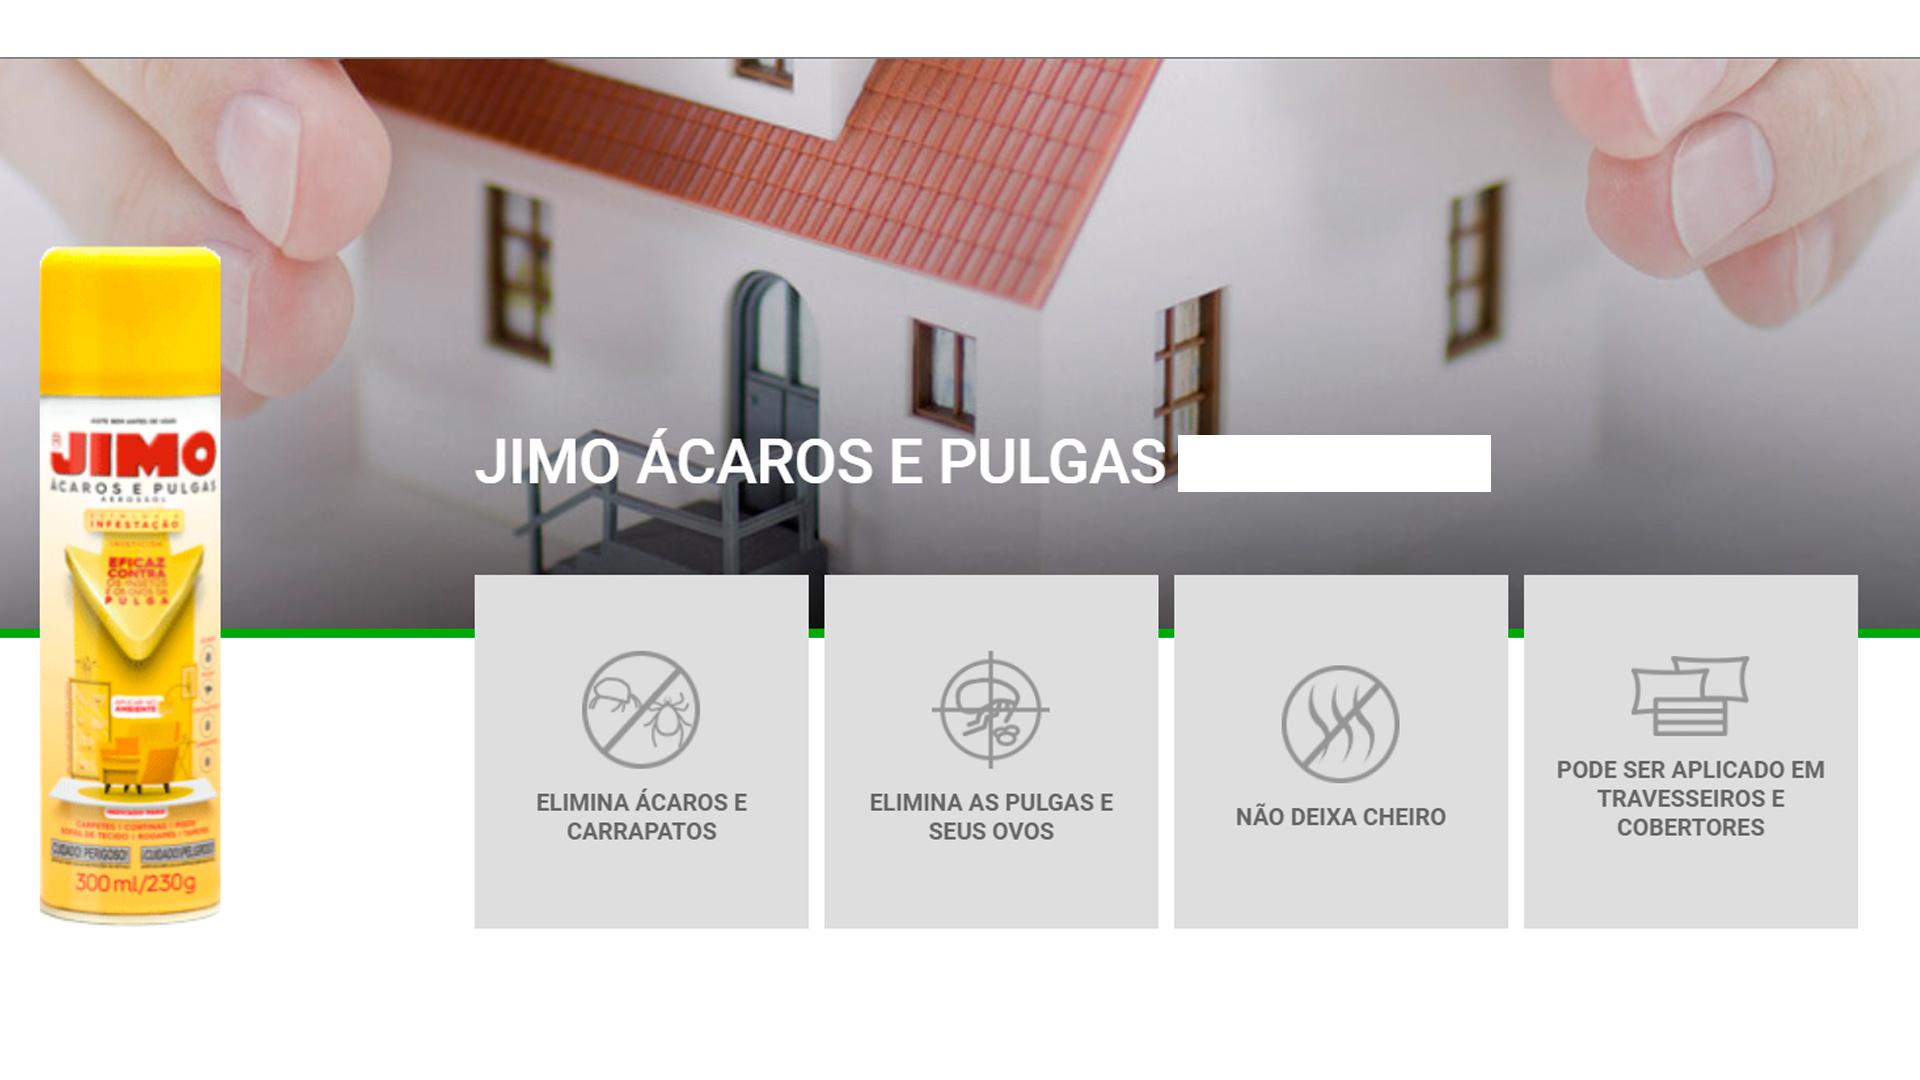 Jimo Anti Ácaros Pulgas E Carrapatos 300ml